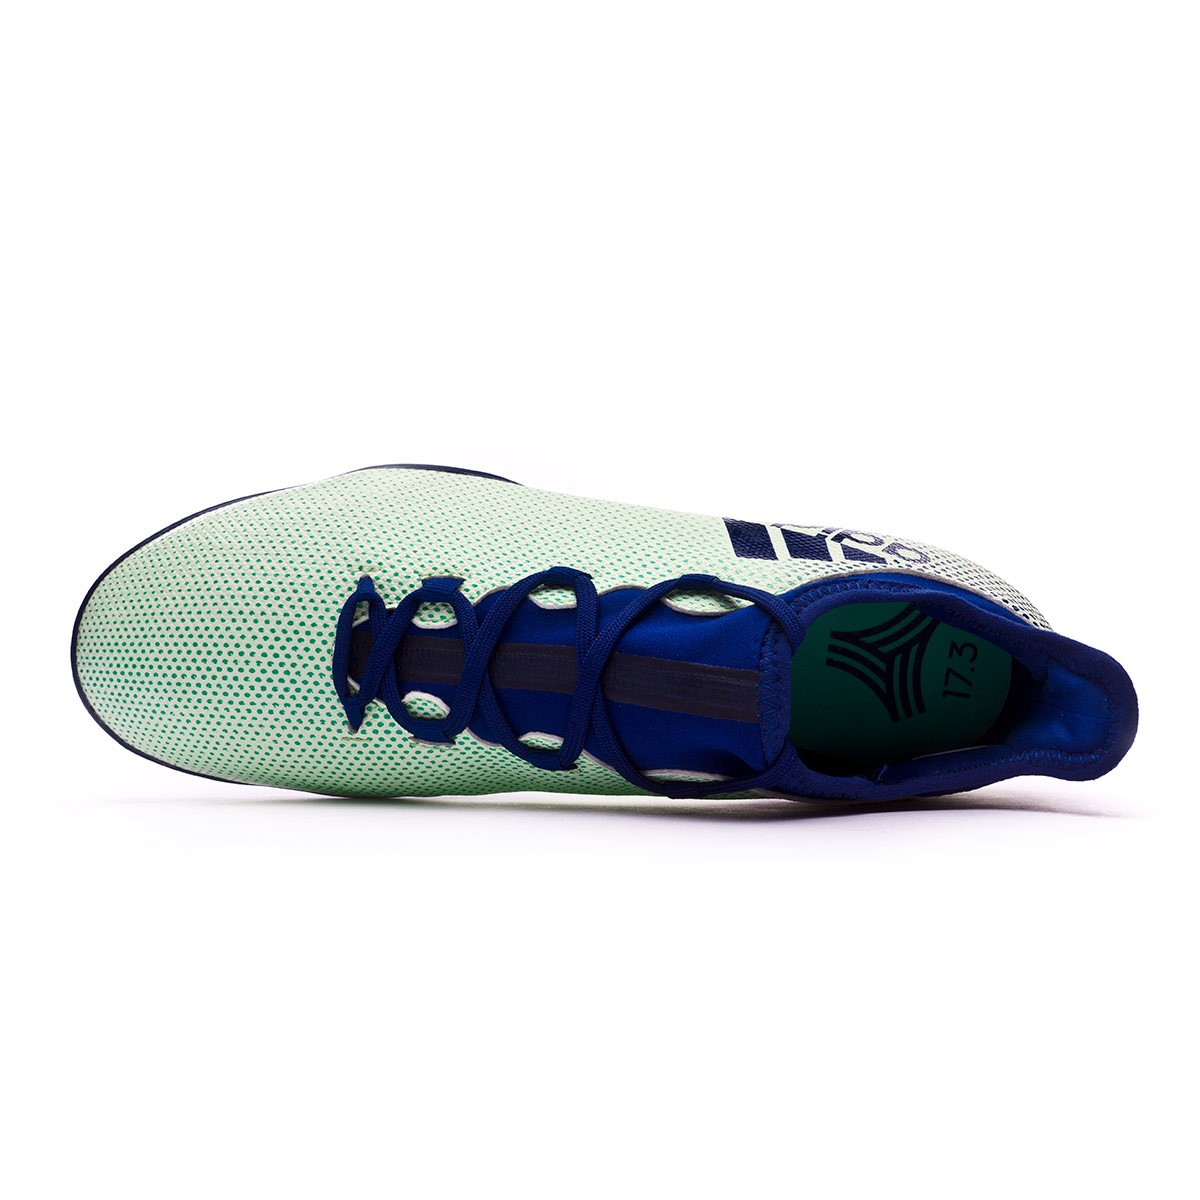 4a0012da6 Football Boot adidas X Tango 17.3 Turf Hi-res green-Unity ink-Aero green -  Tienda de fútbol Fútbol Emotion